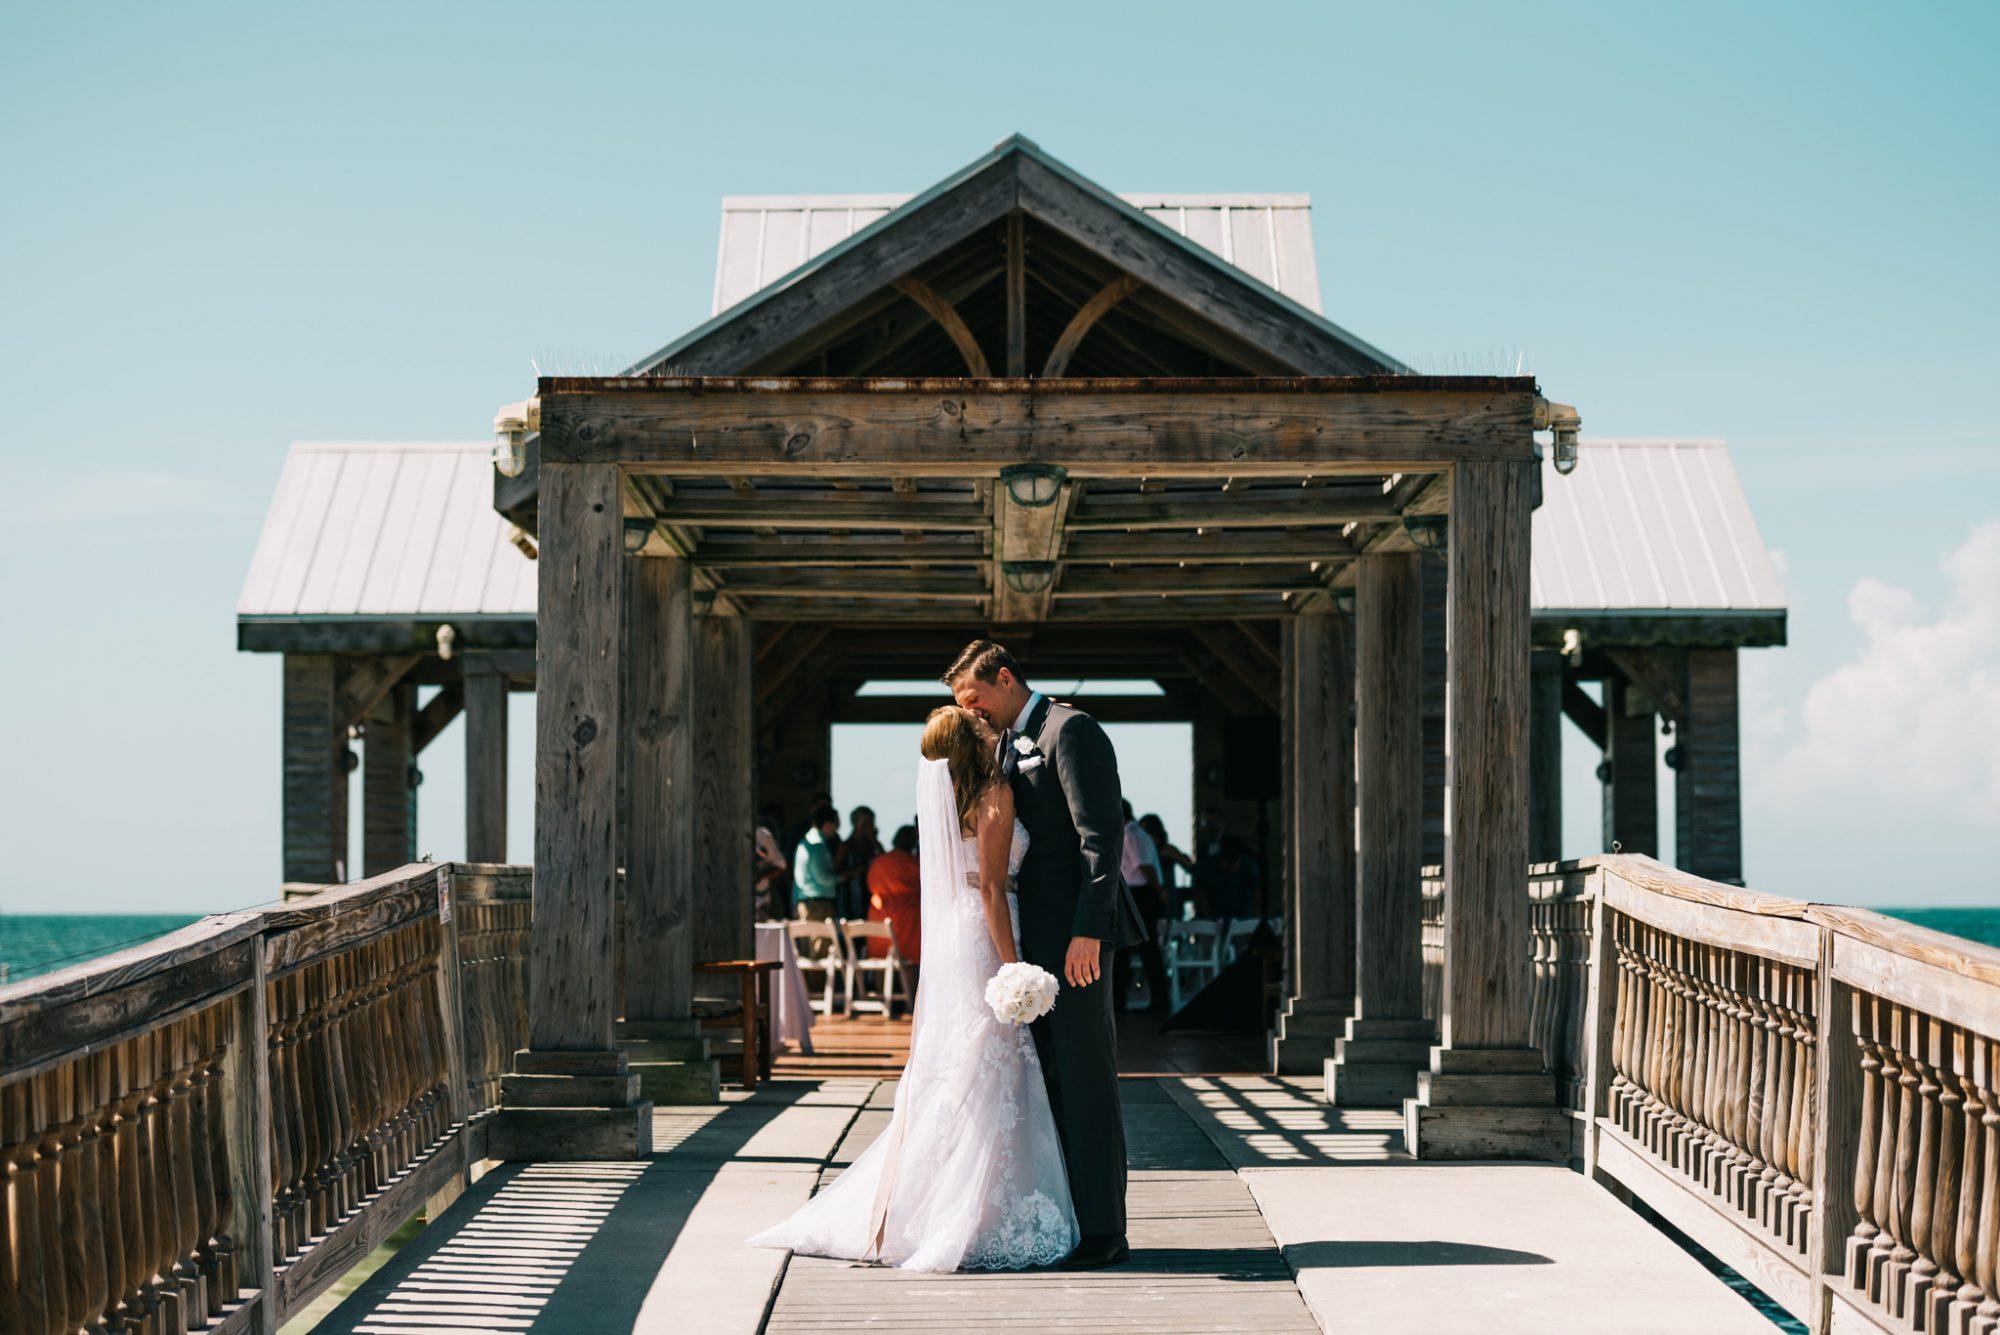 Stacey Jason Key West Wedding Photographer Reach Resort 22 - Stacy & Jason - Key West Wedding Photographer - Reach Resort